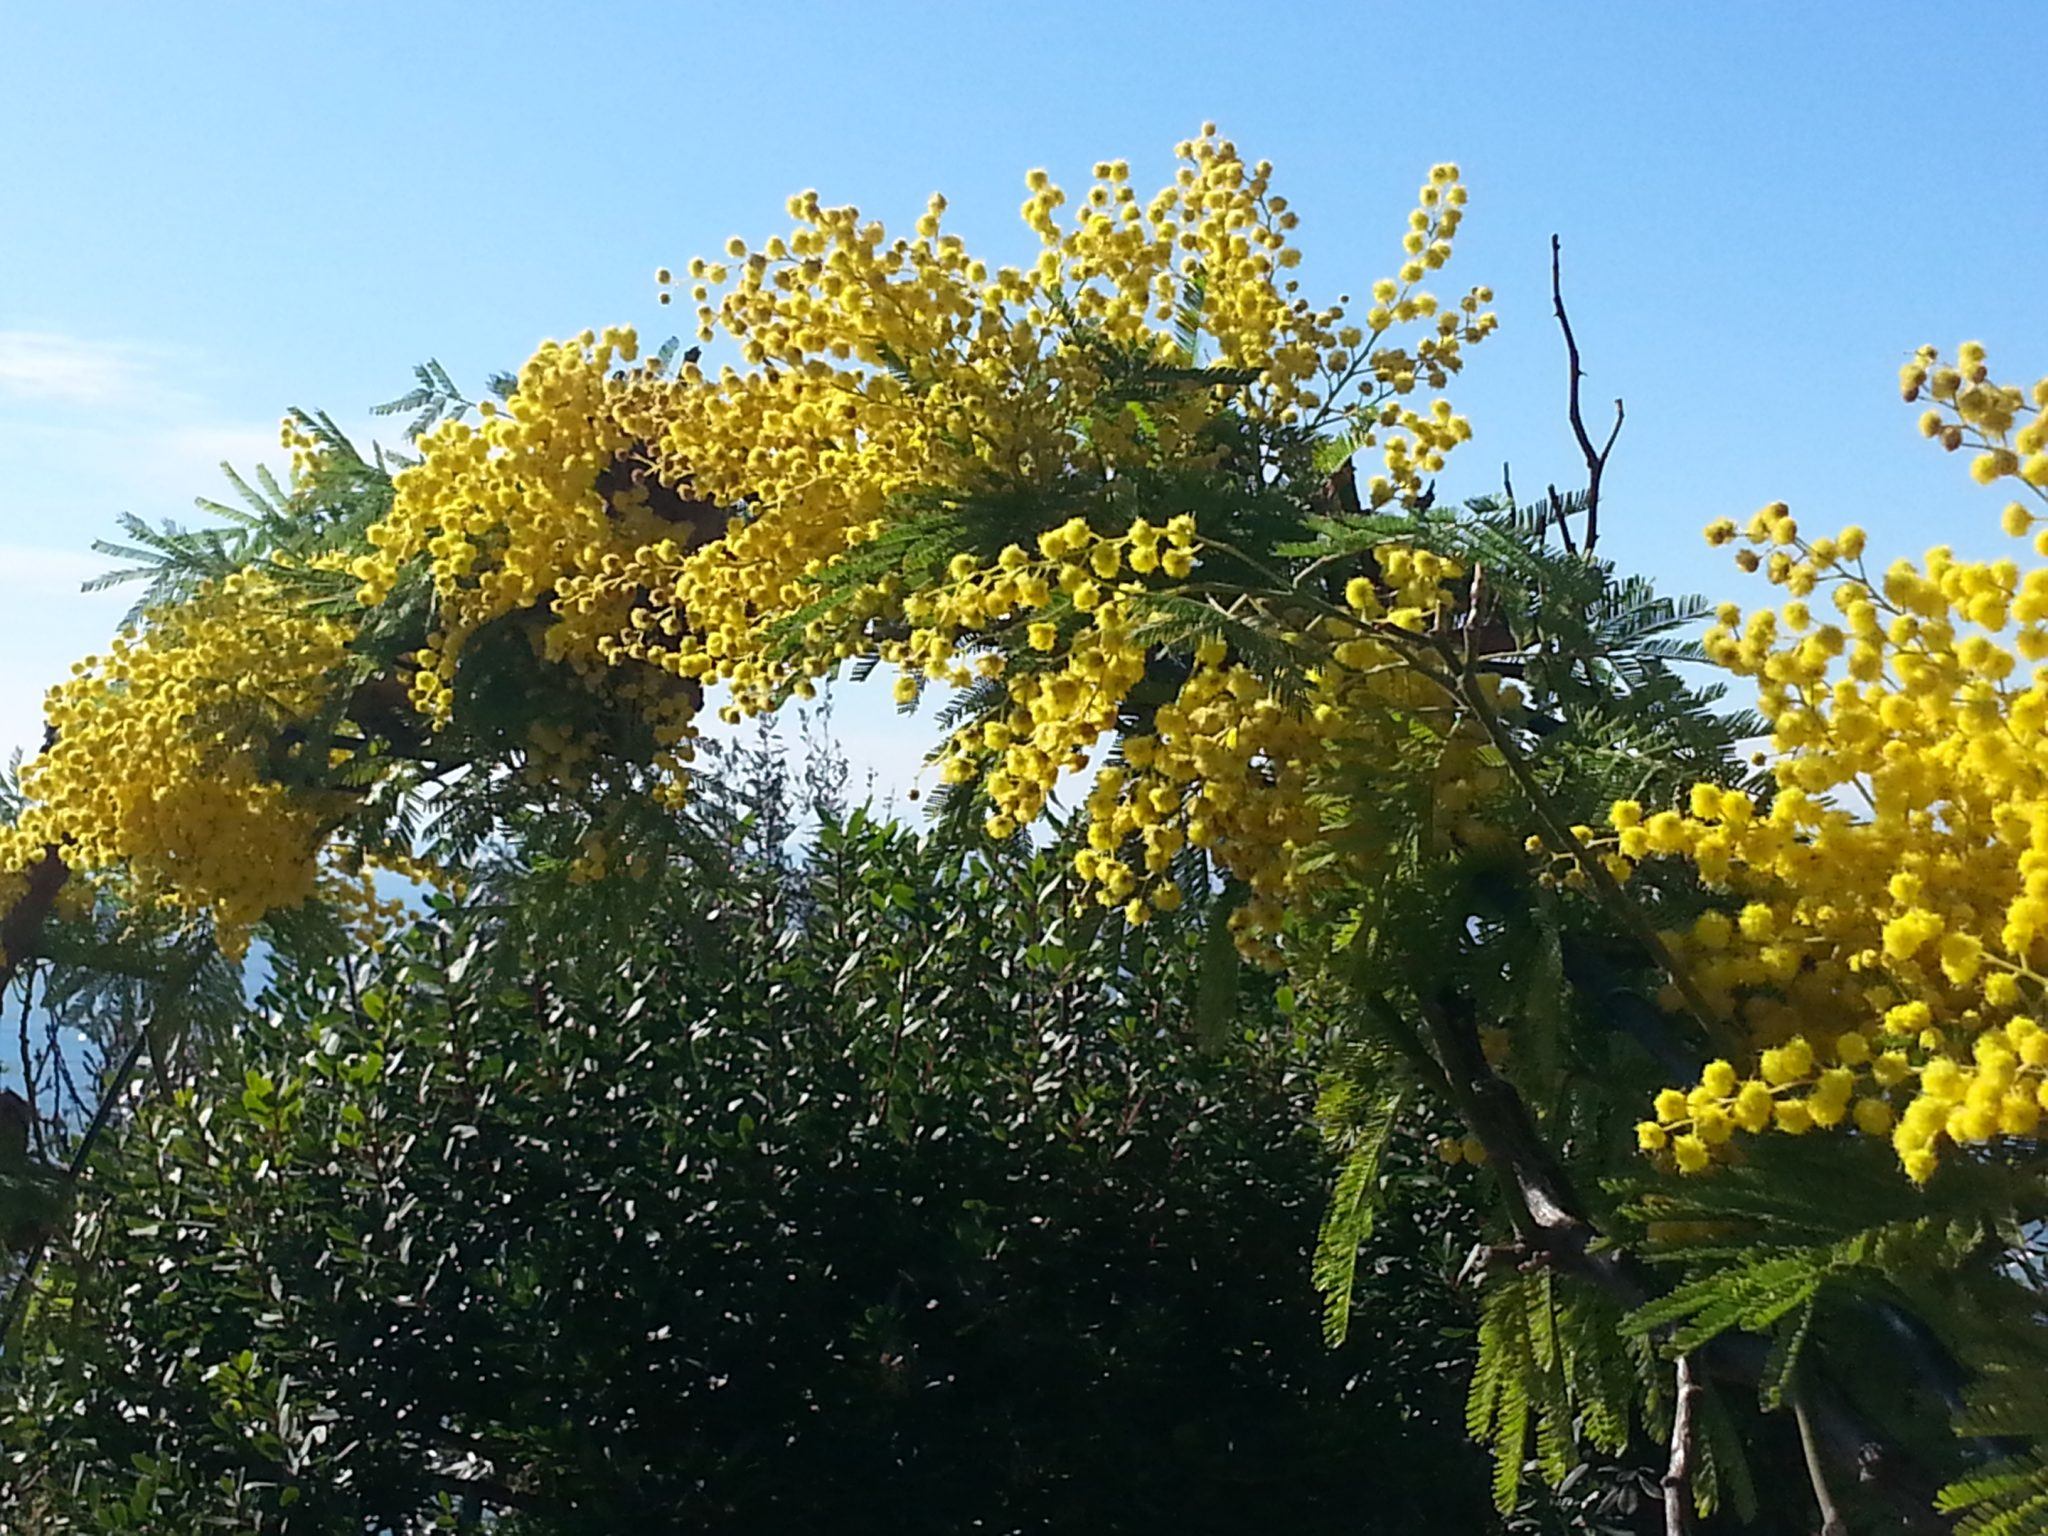 Mimosa flowers in the Italian Riviera